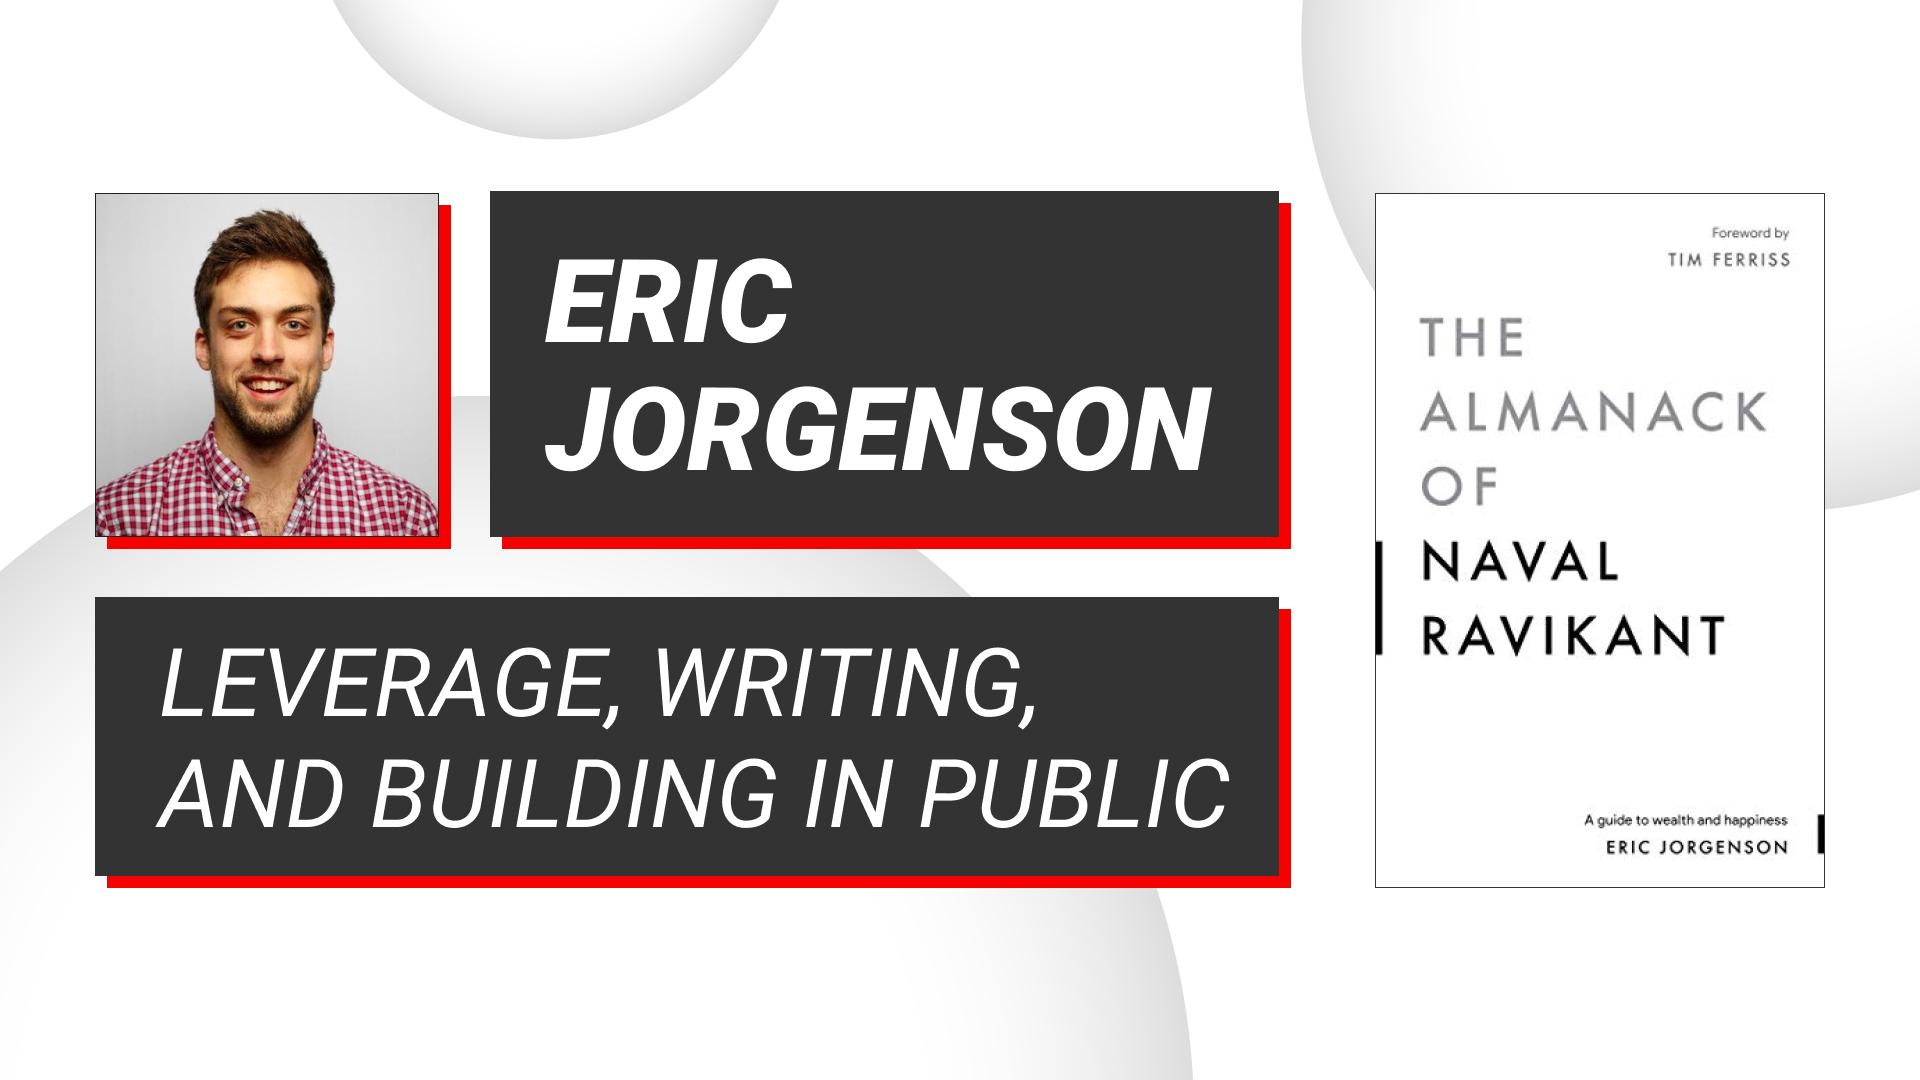 Eric Jorgenson & The Almanack of Naval Ravikant